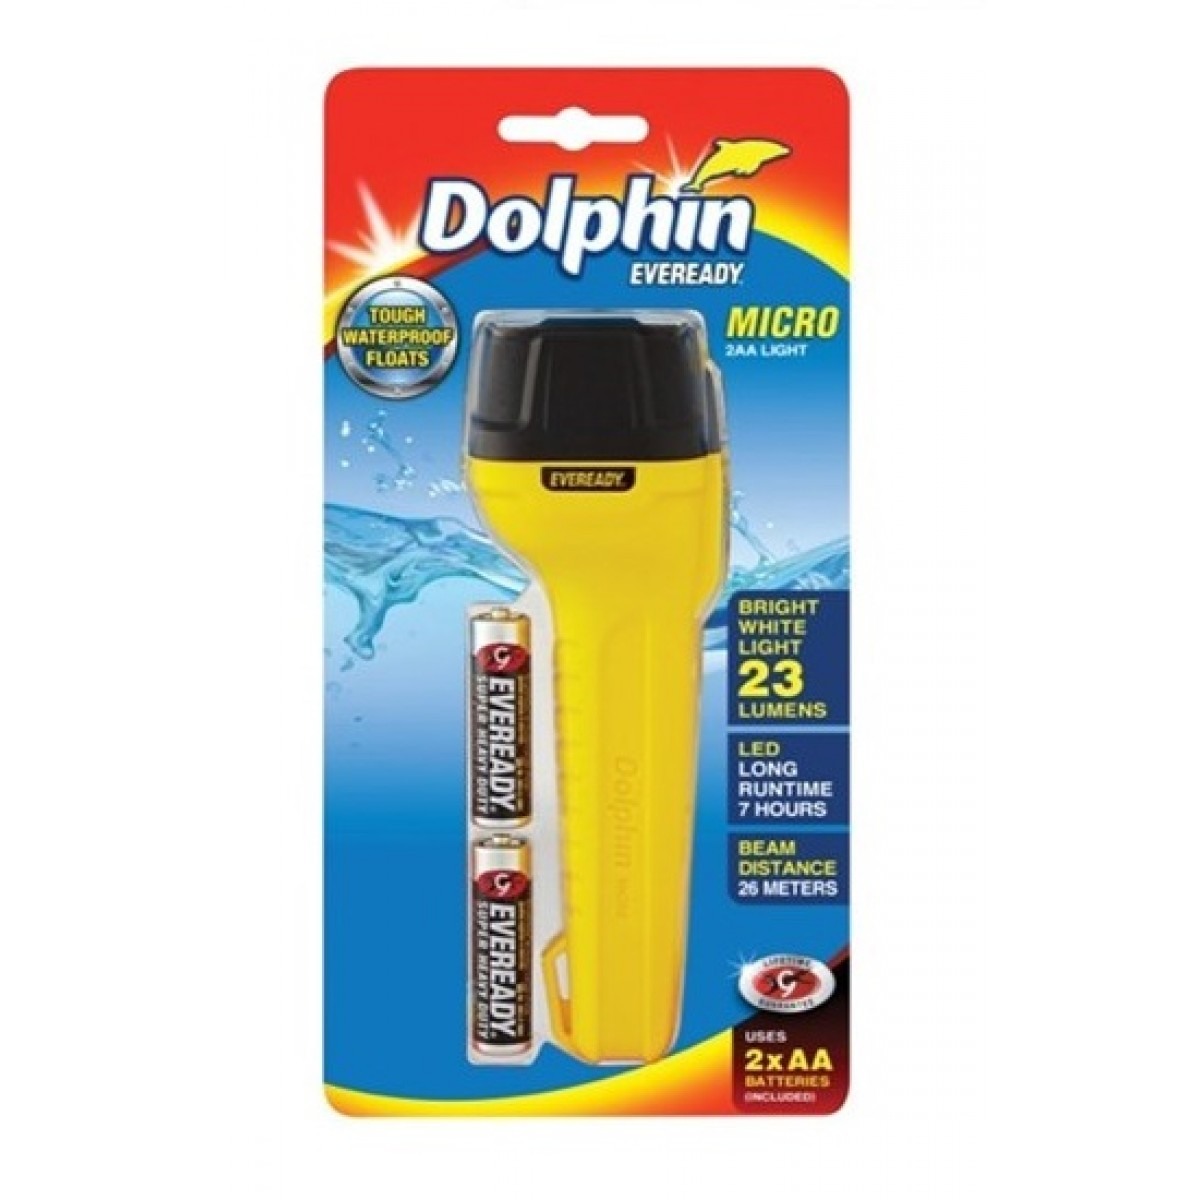 Eveready Dolphin Micro 2AA Waterproof Float 23L Flashlight DOL2AA2